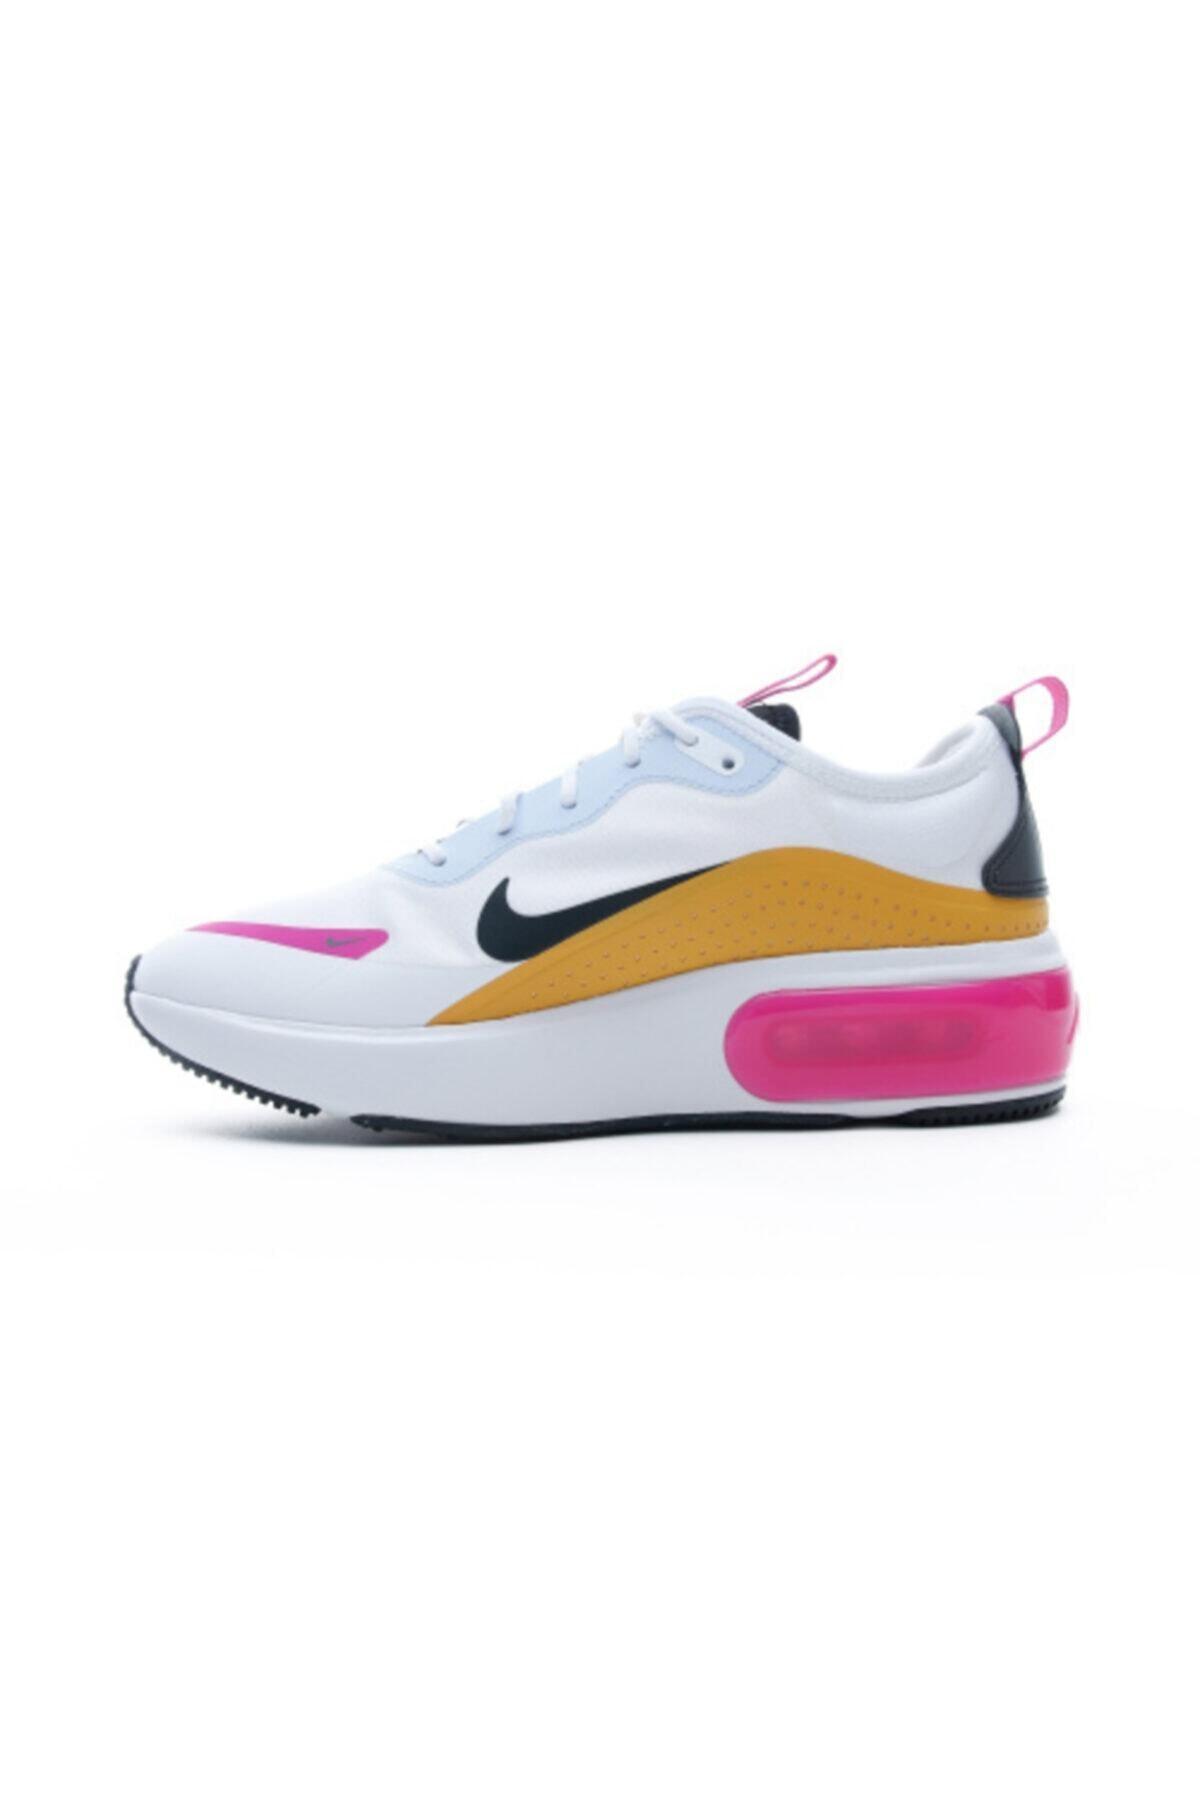 Nike Kadın Air Max Dia Ayakkabısı Cj0636-100 2